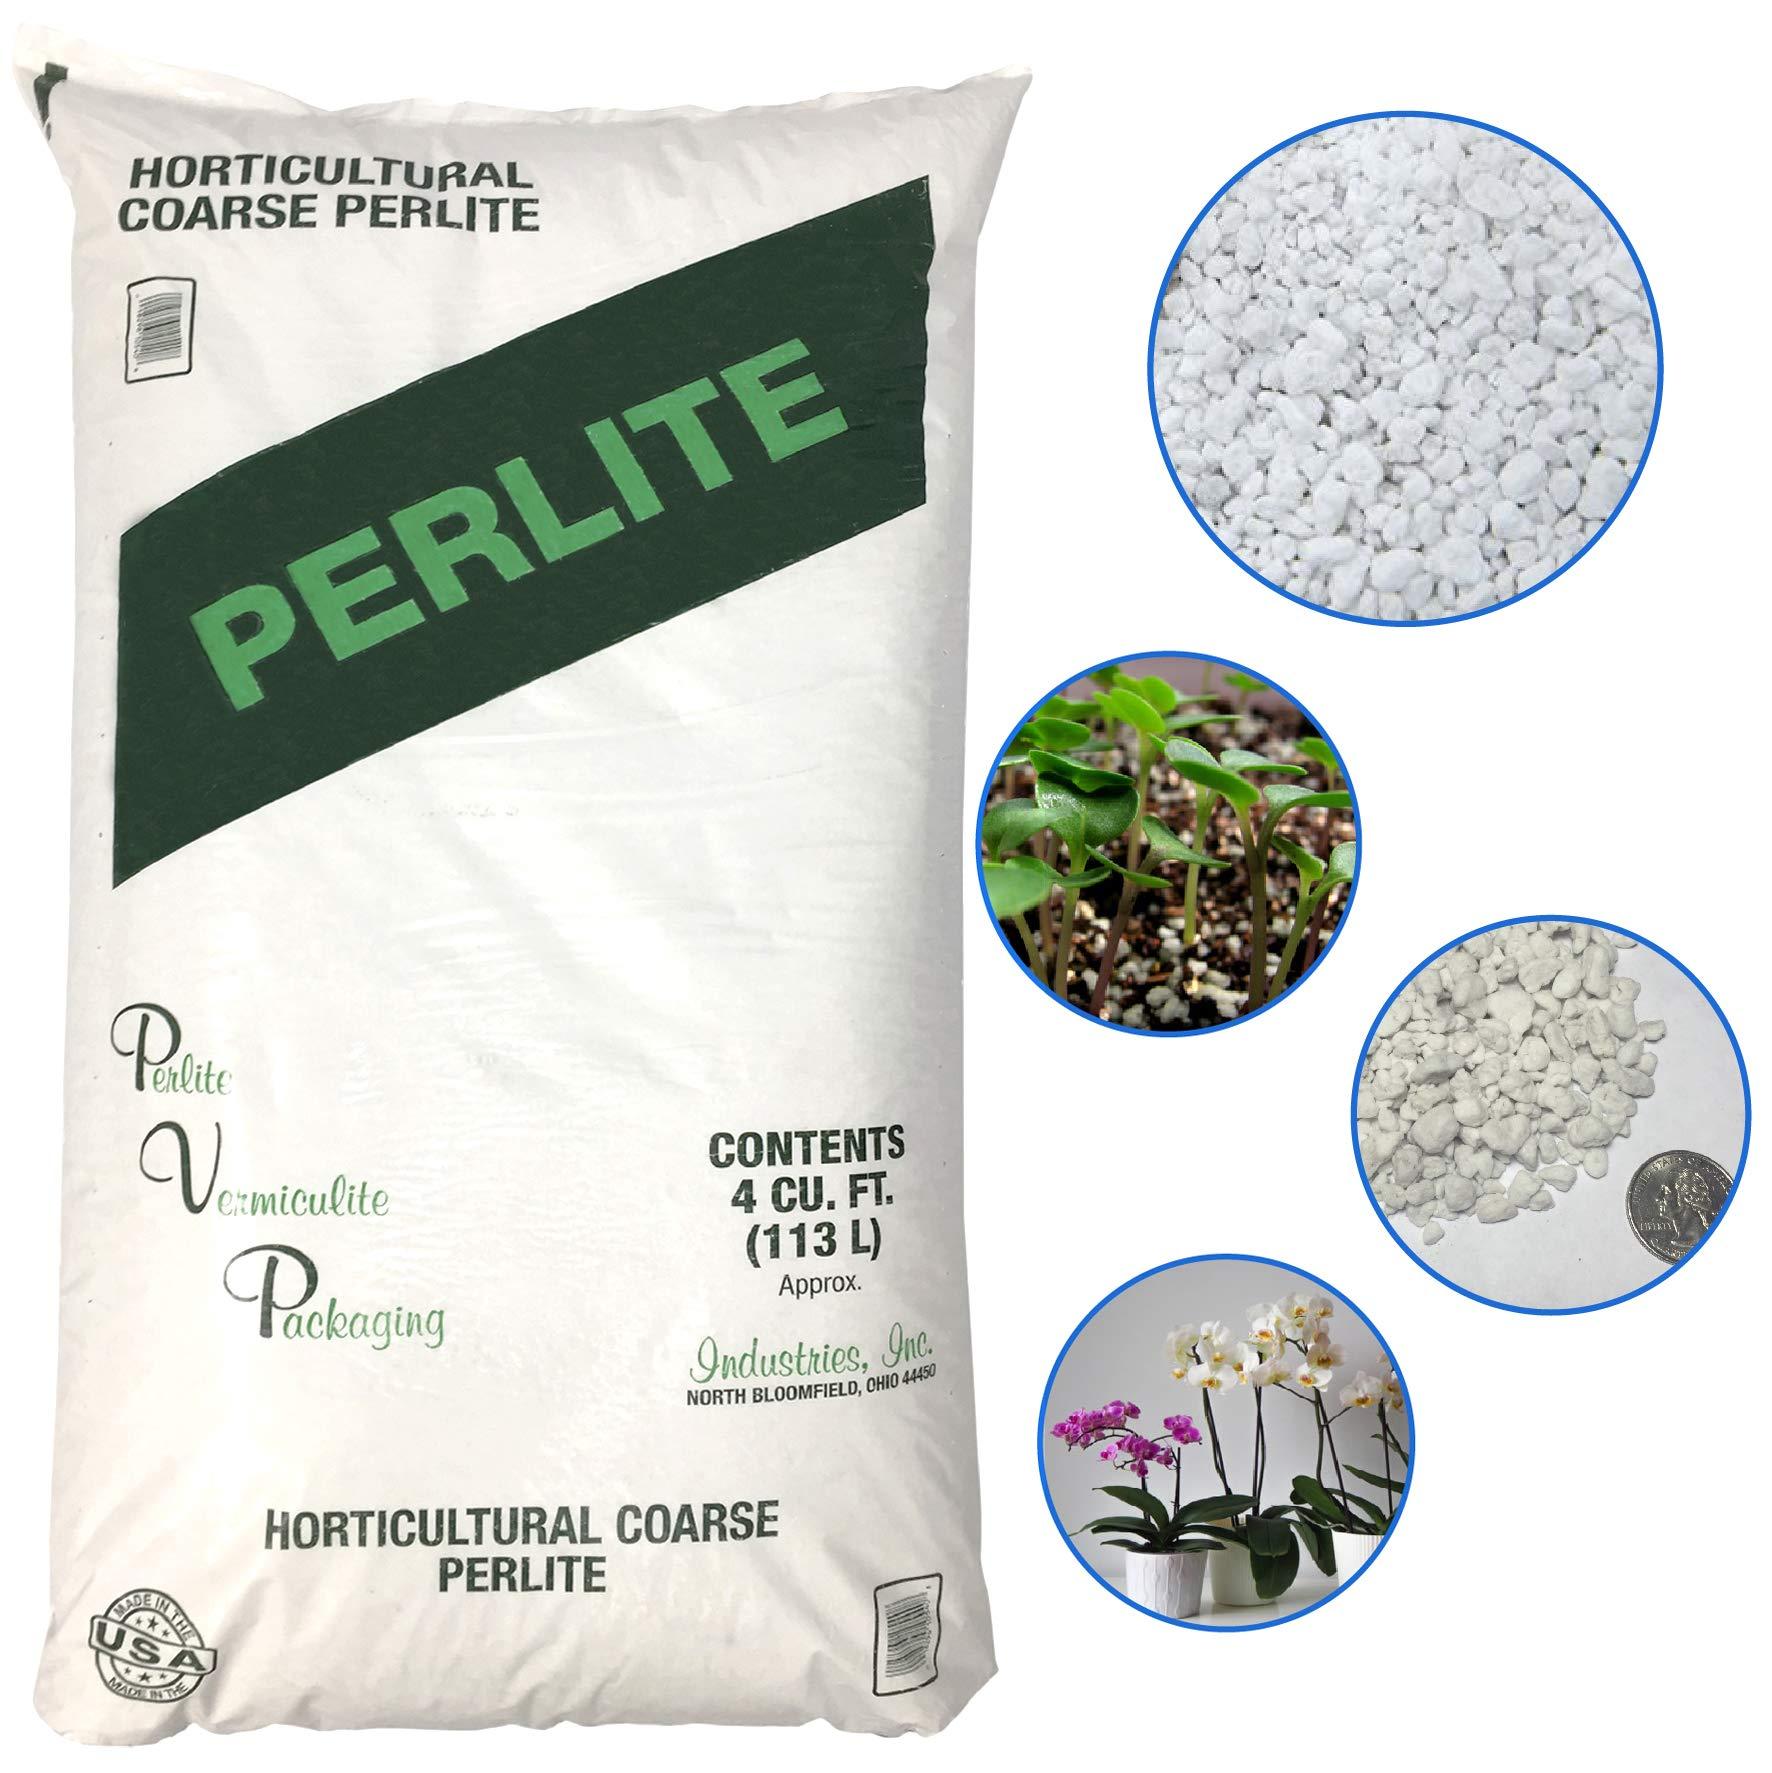 PVP Industries Inc PVP105408 Pelite 120 Quarts - 4 Cubic Foot of Organic Perlite Planting Soil Additive Gi, White